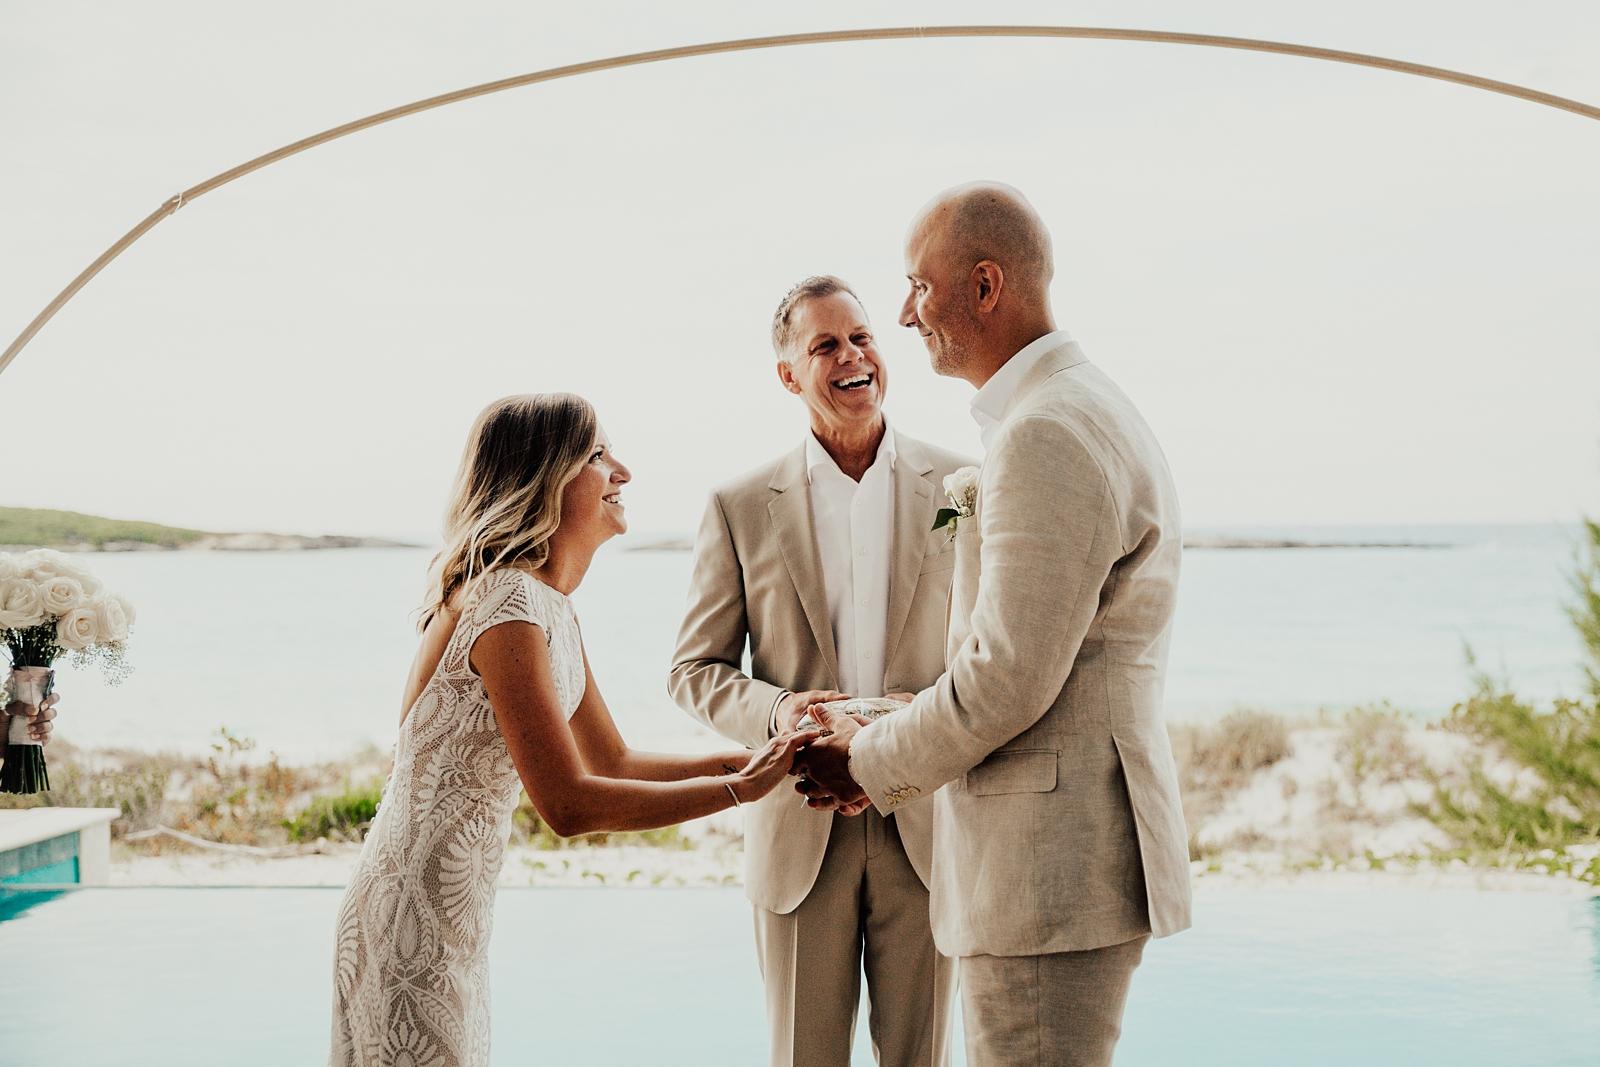 Jenni & Andrew Intimate Beach Destination Wedding in Little Exuma, Bahamas_0510.jpg